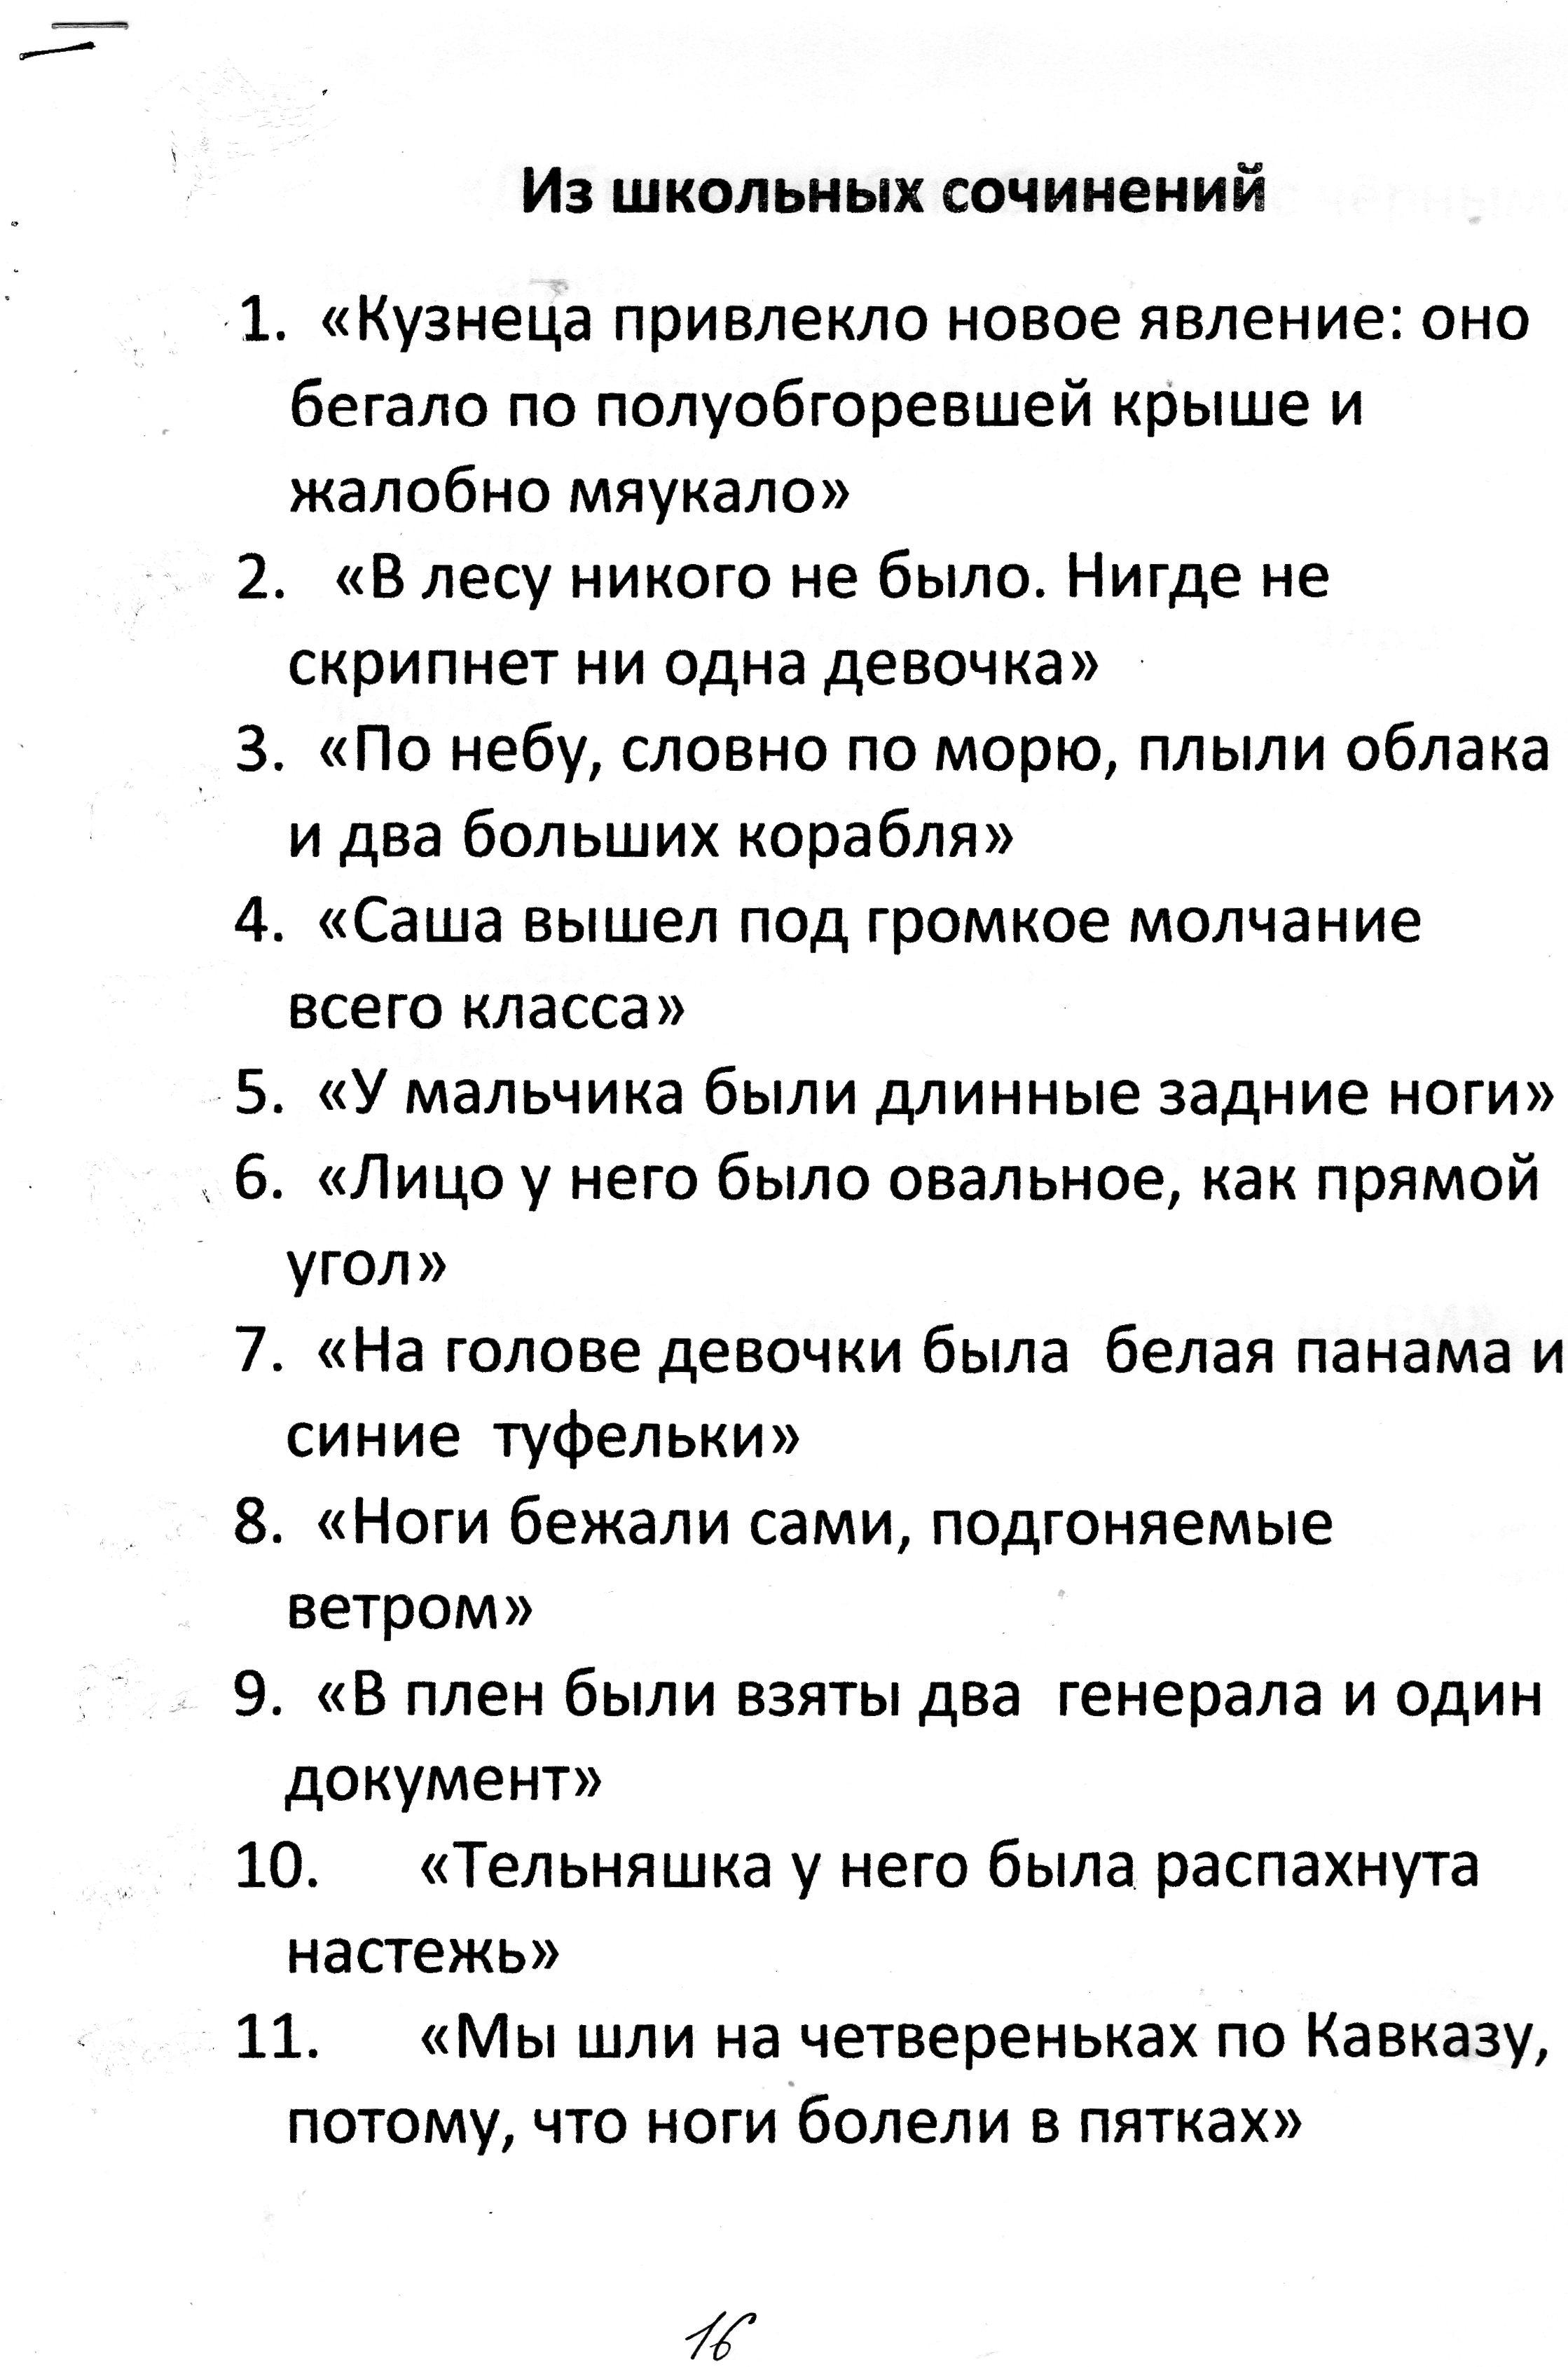 C:\Documents and Settings\ADMIN\Мои документы\9 кл выпускной\img022.jpg